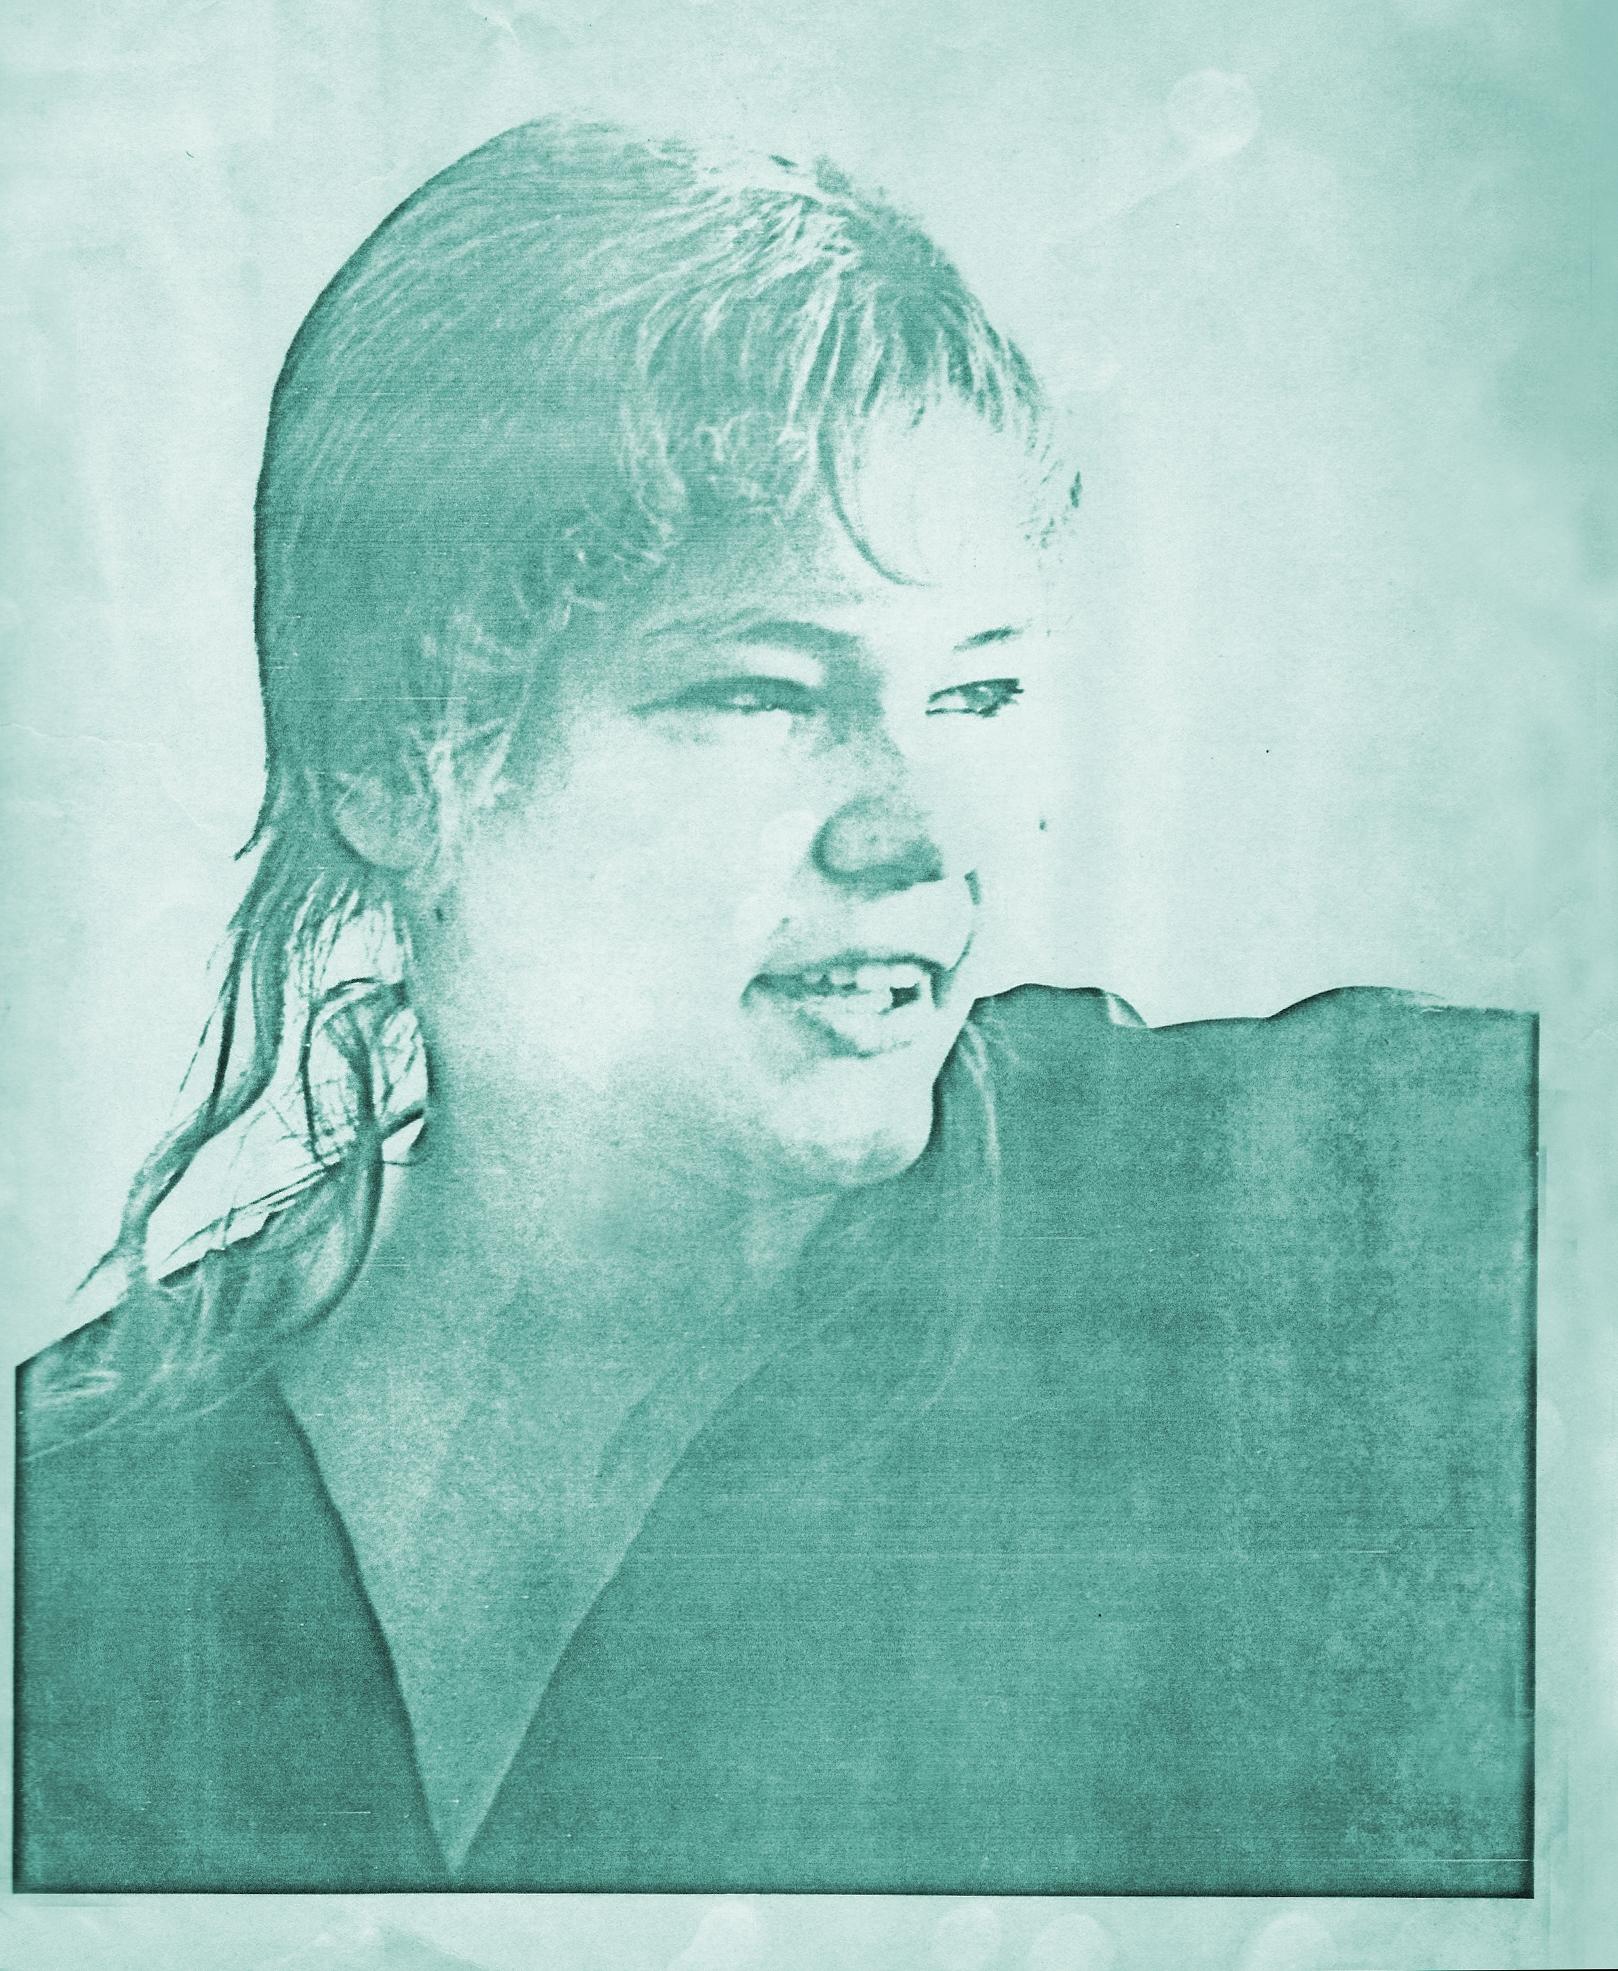 Kim Watts - Vocals, Xylophone, Harmonica, Tambourine, Attitude